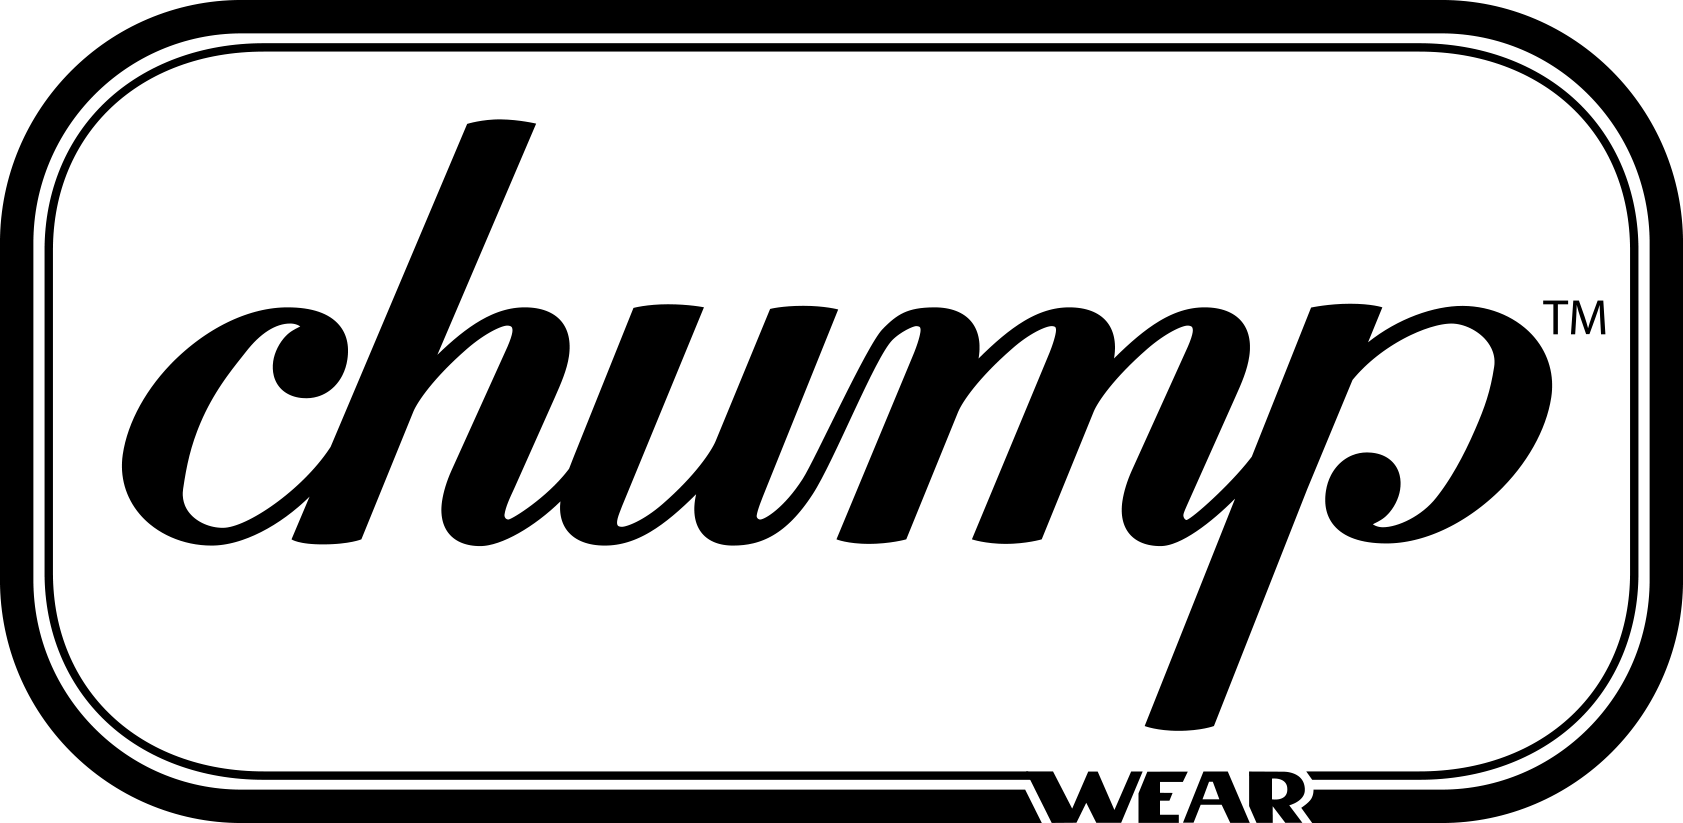 chumpwear logo_EXTRACT_BLACK.png